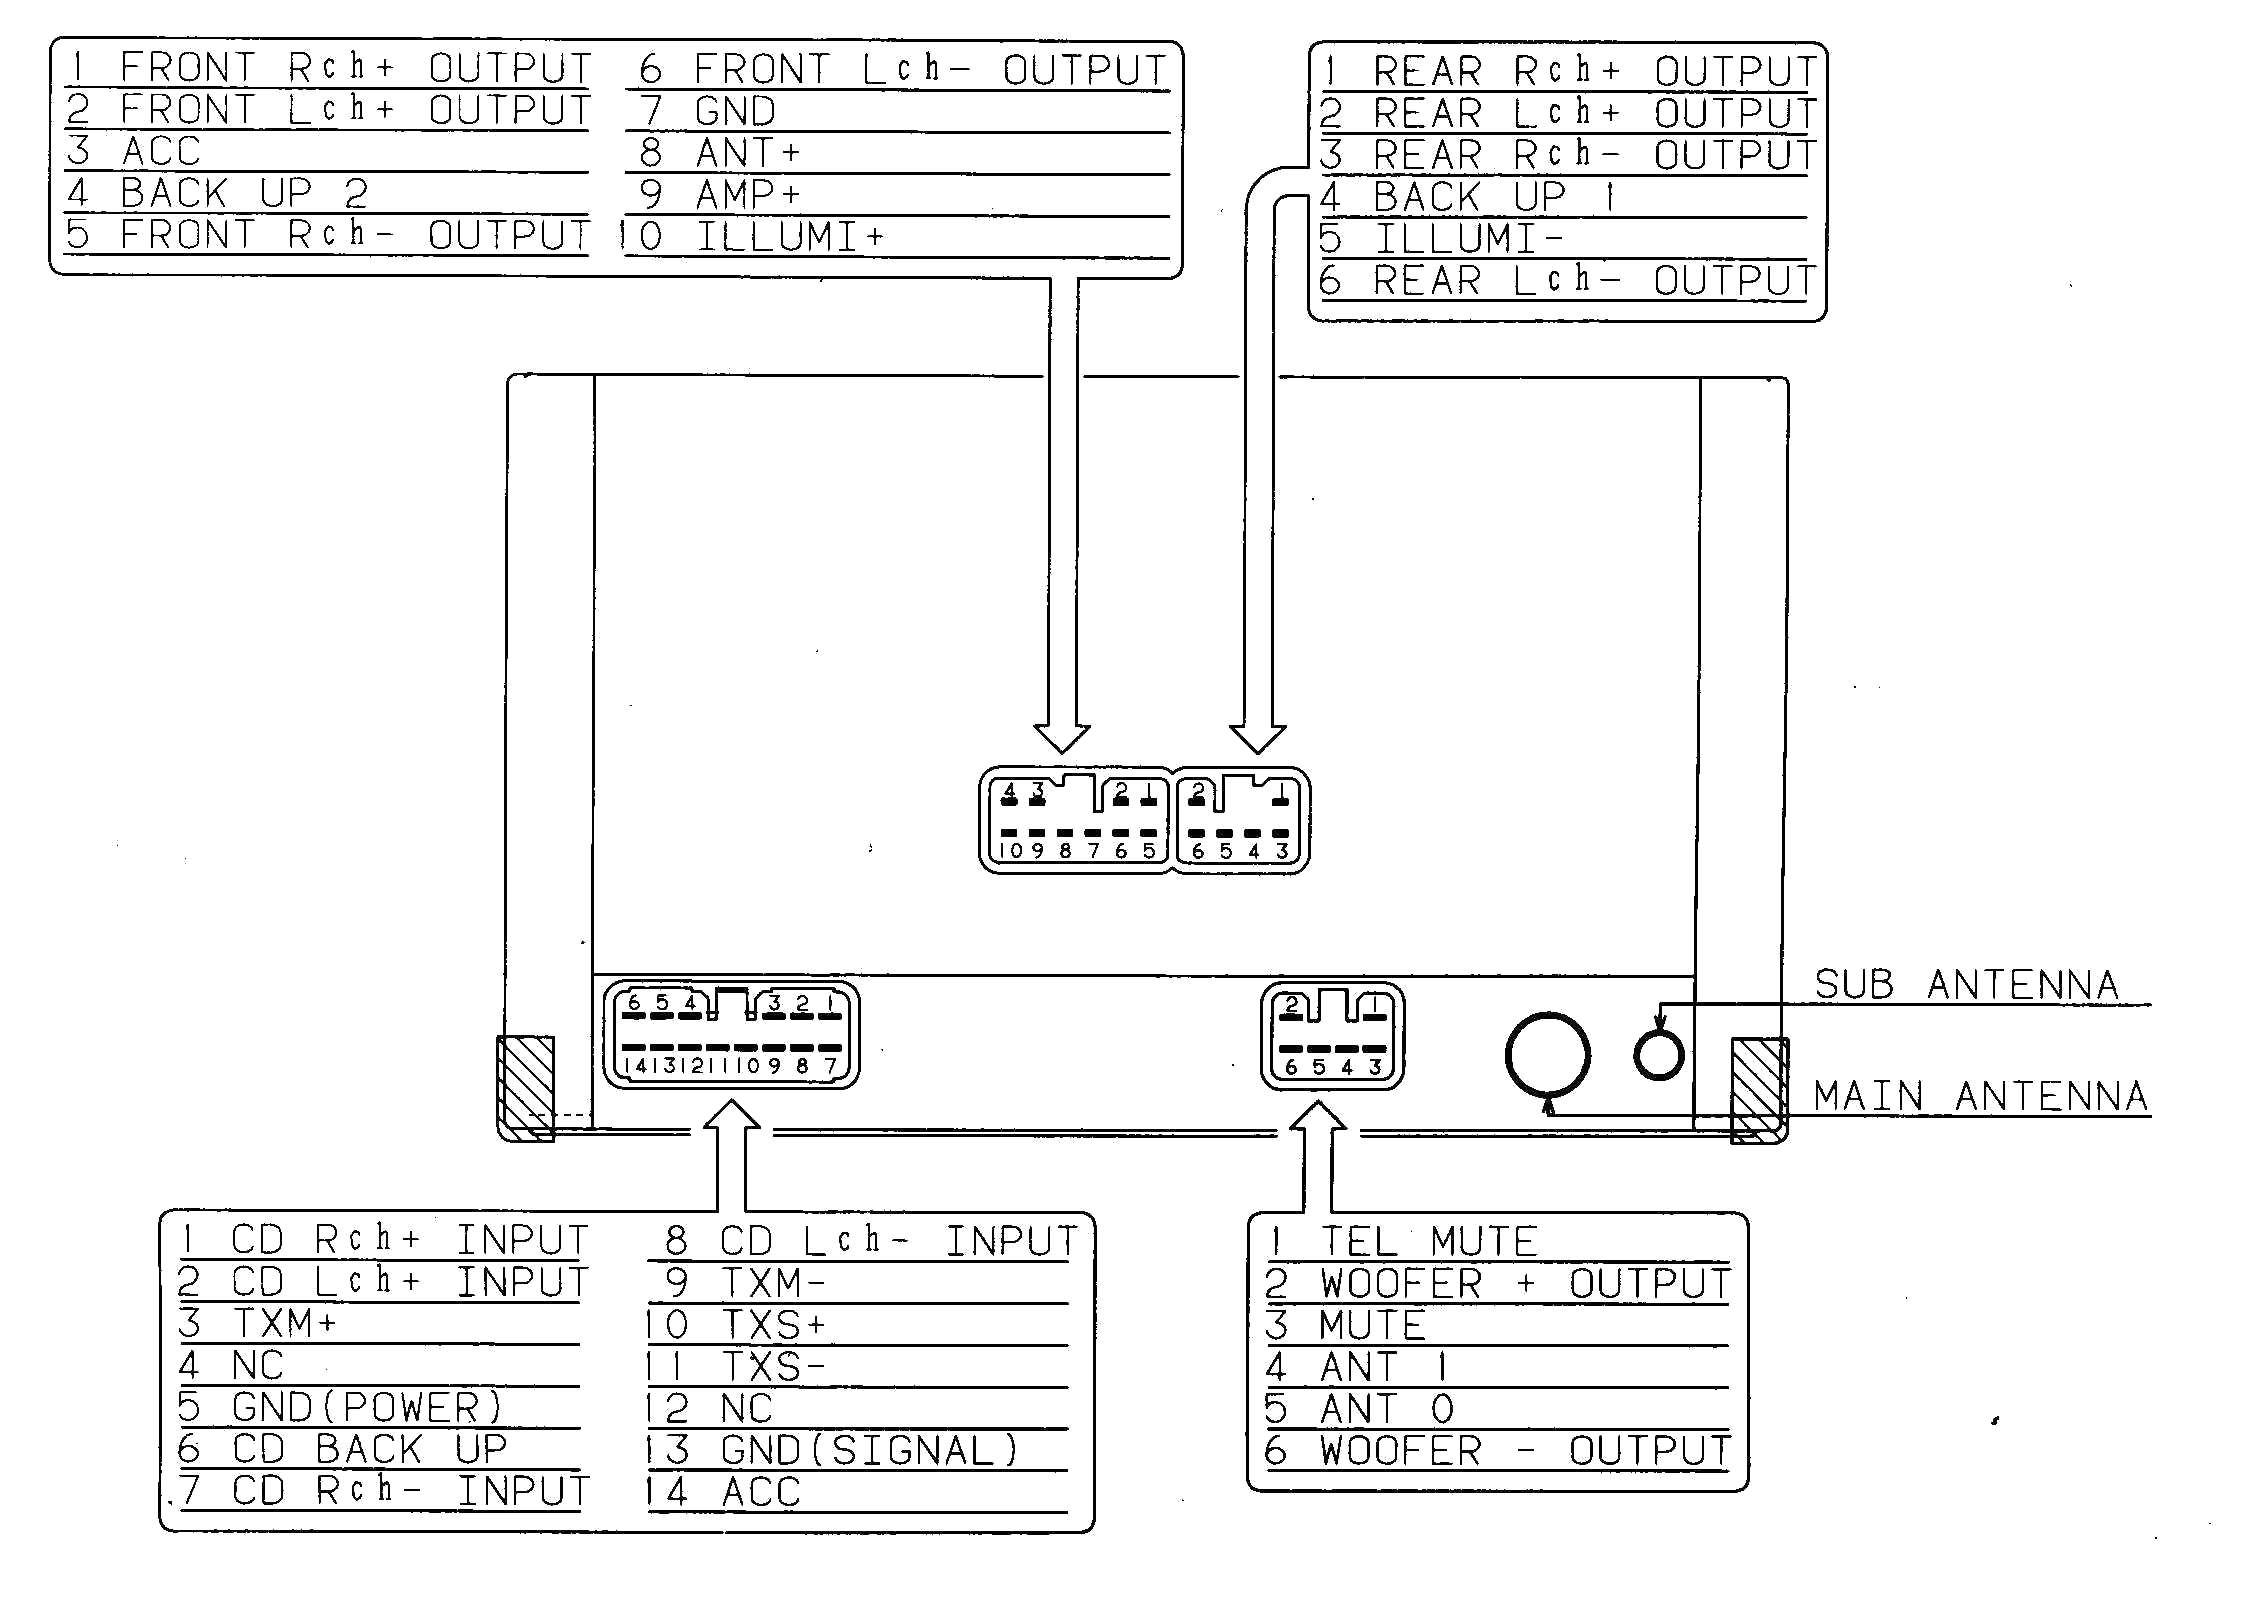 pioneer deh p6000ub wiring diagram elegant pioneer deh p4200ub wiring diagram floralfrocks and arcnx jpg